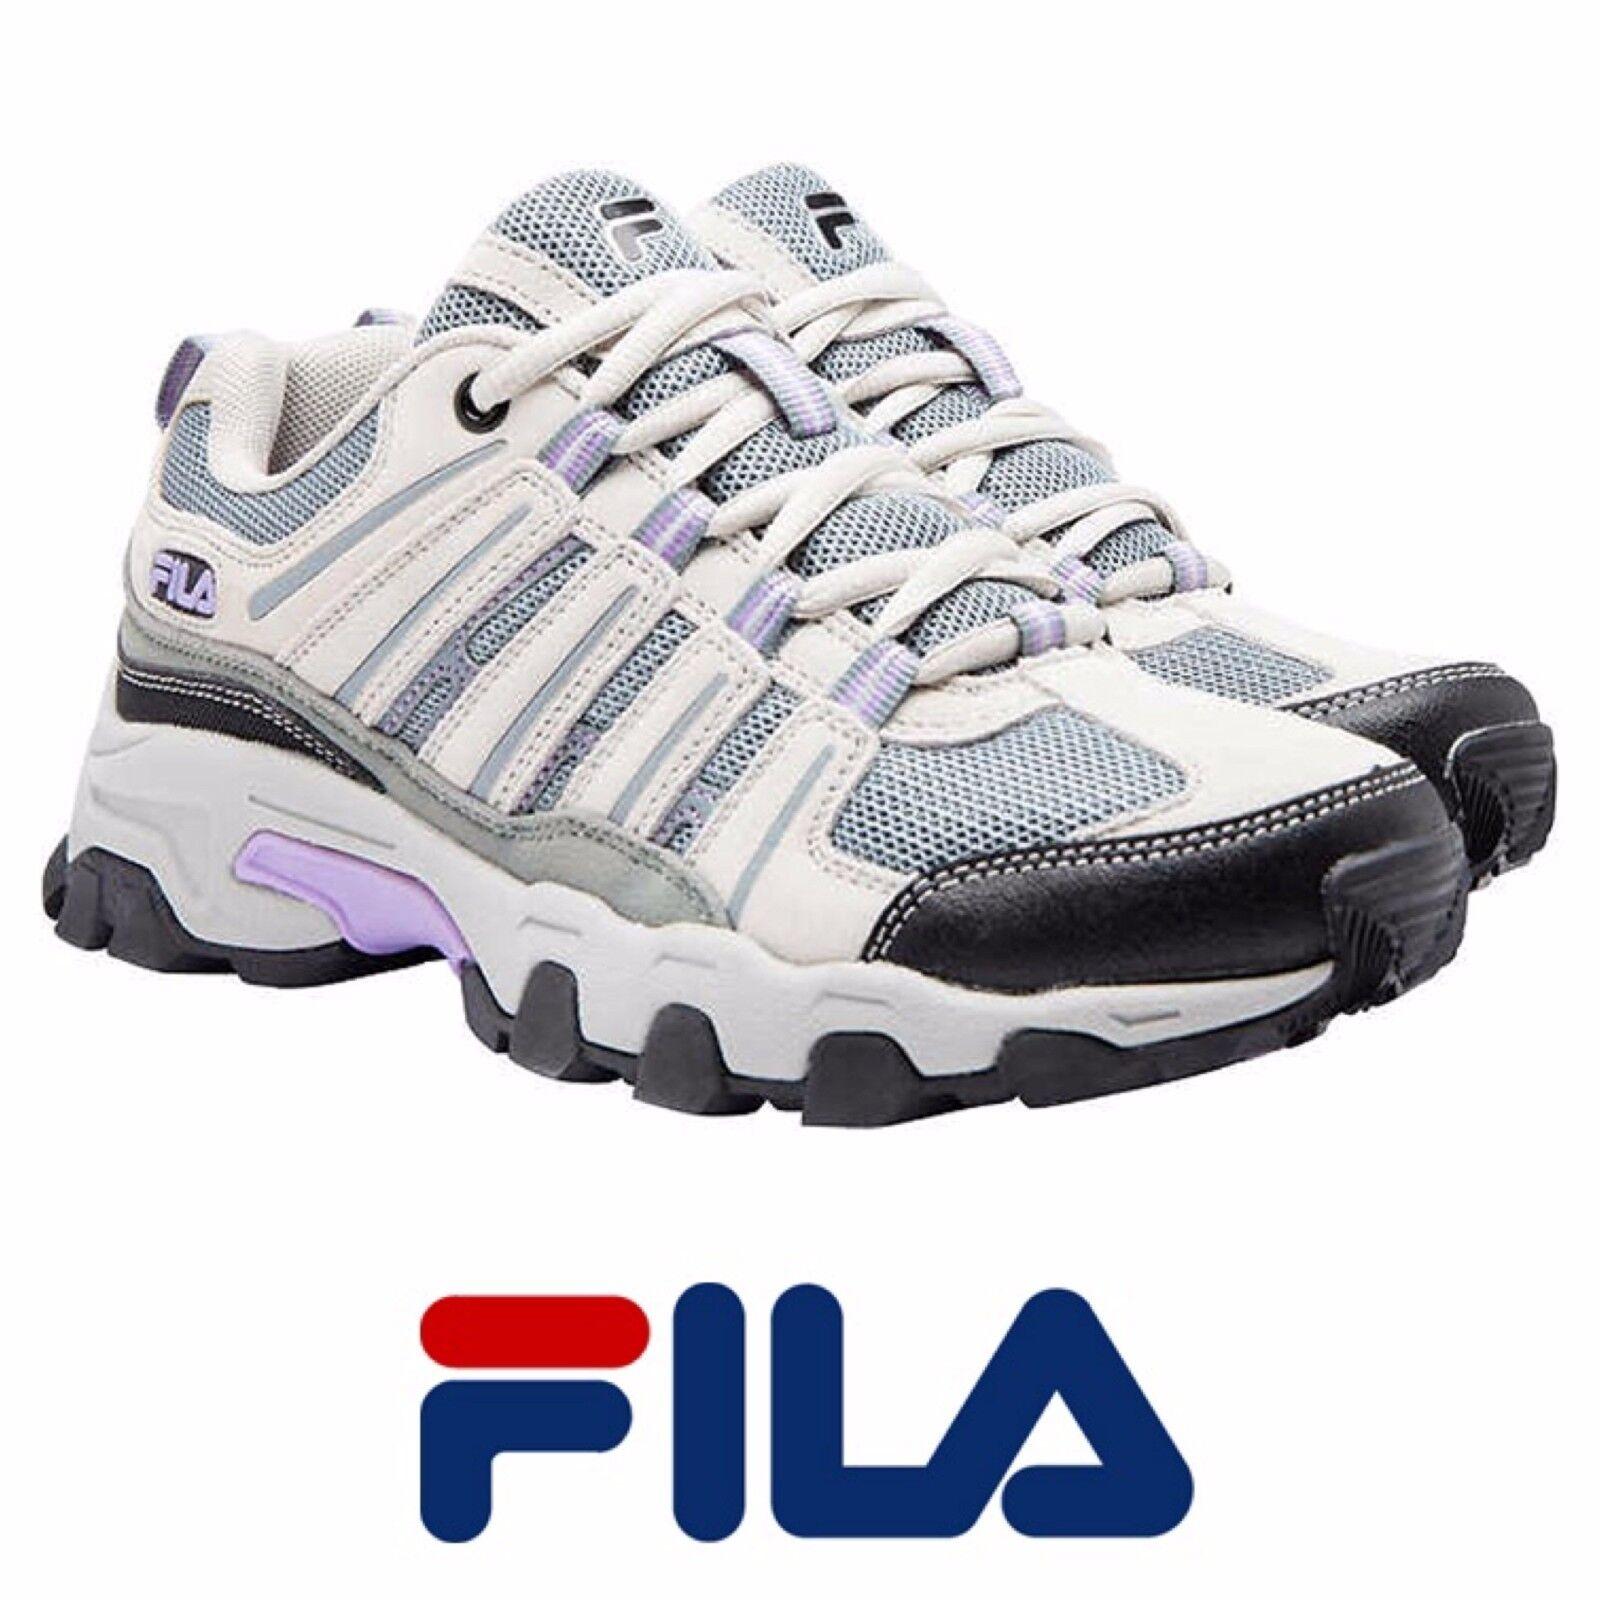 Fila Women's Day Hiker Shoes, Cream/Grey/Lila, Comfortable Brand discount